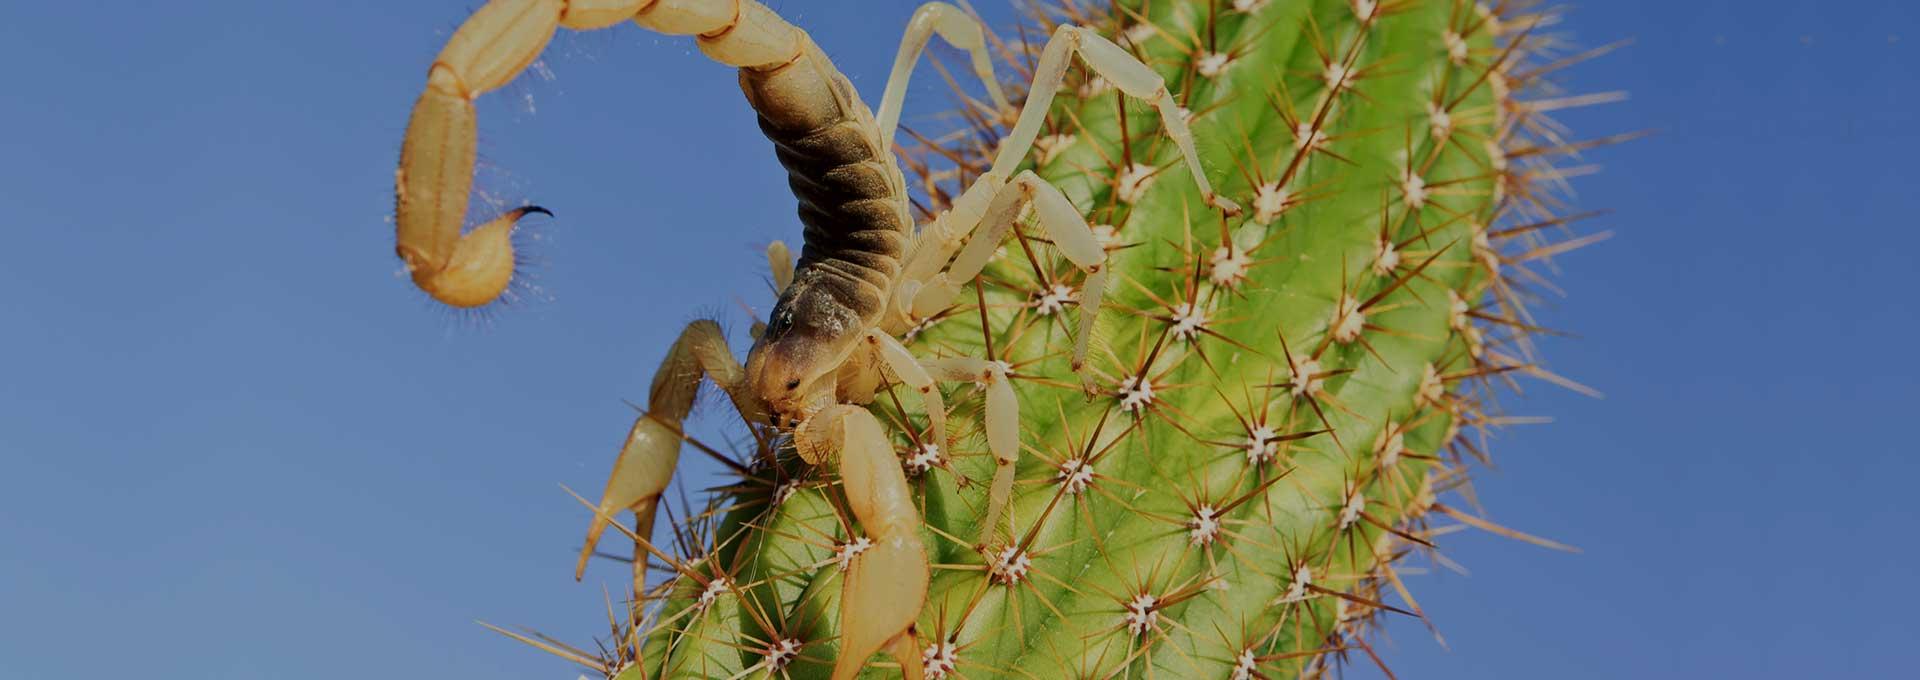 Scorpion Removal Phoenix AZ